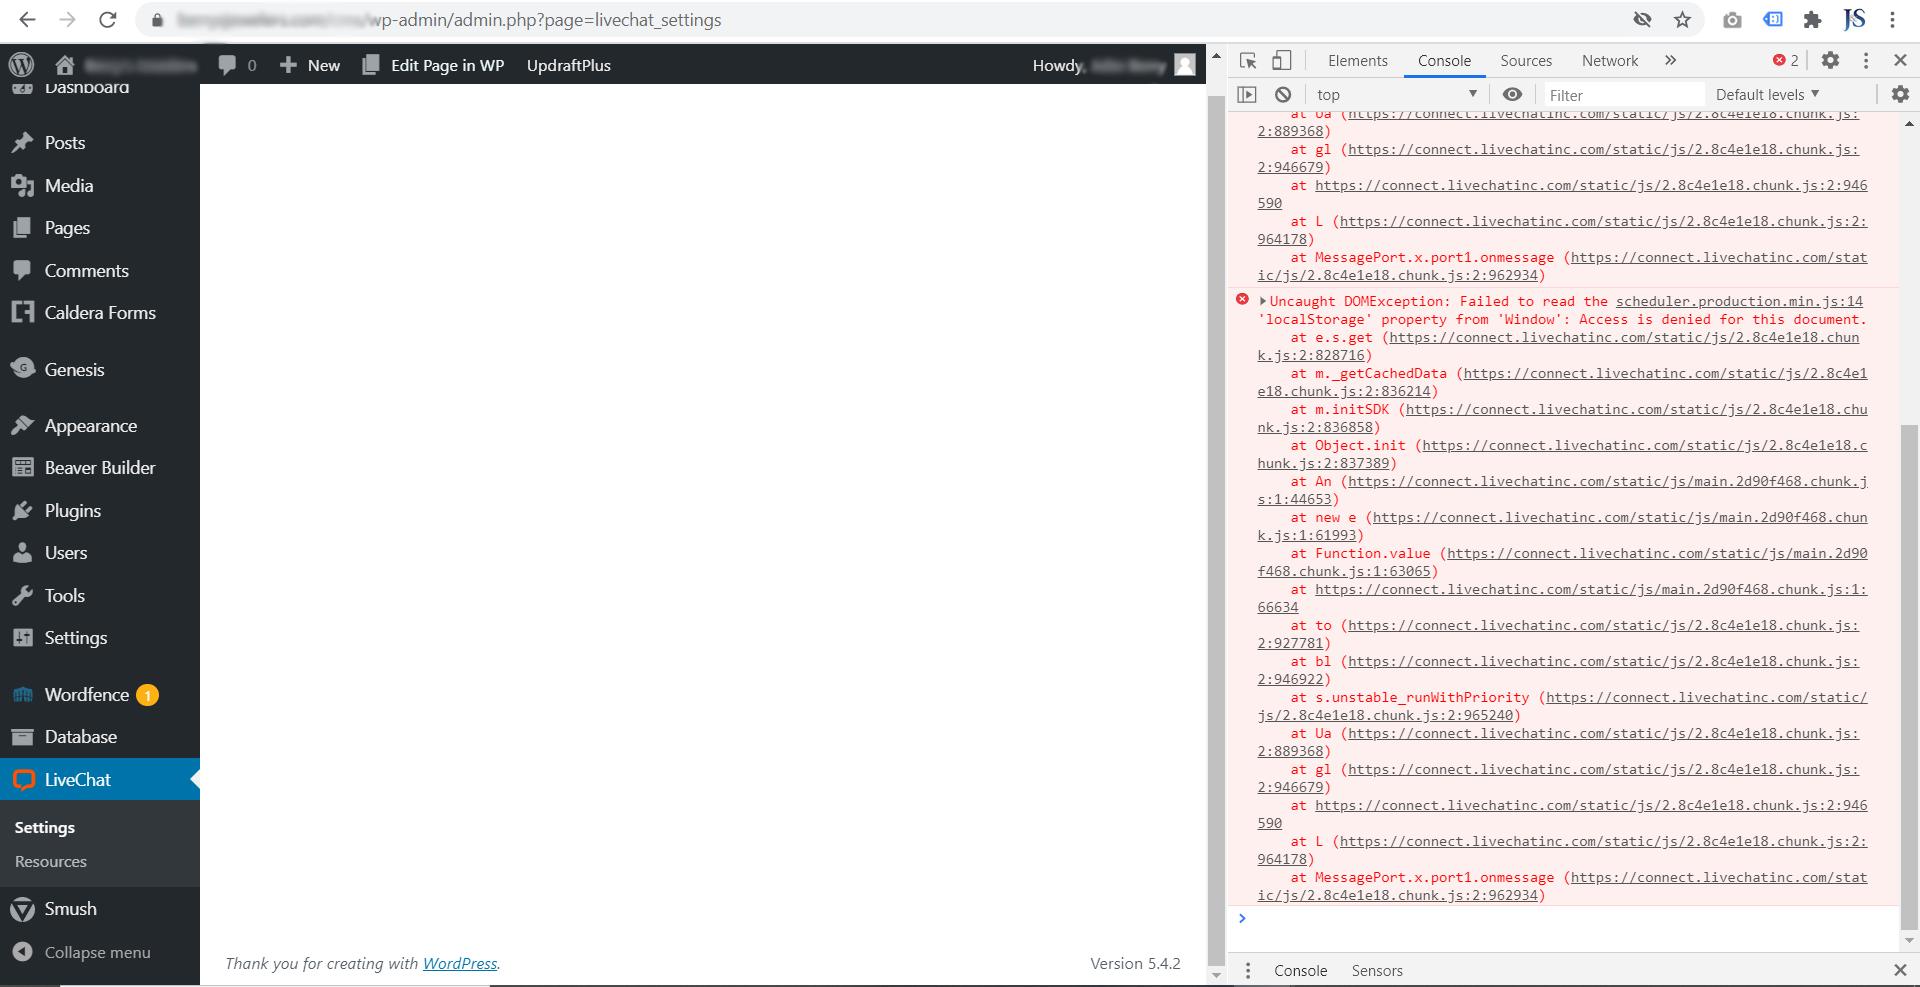 Blank plugin settings page